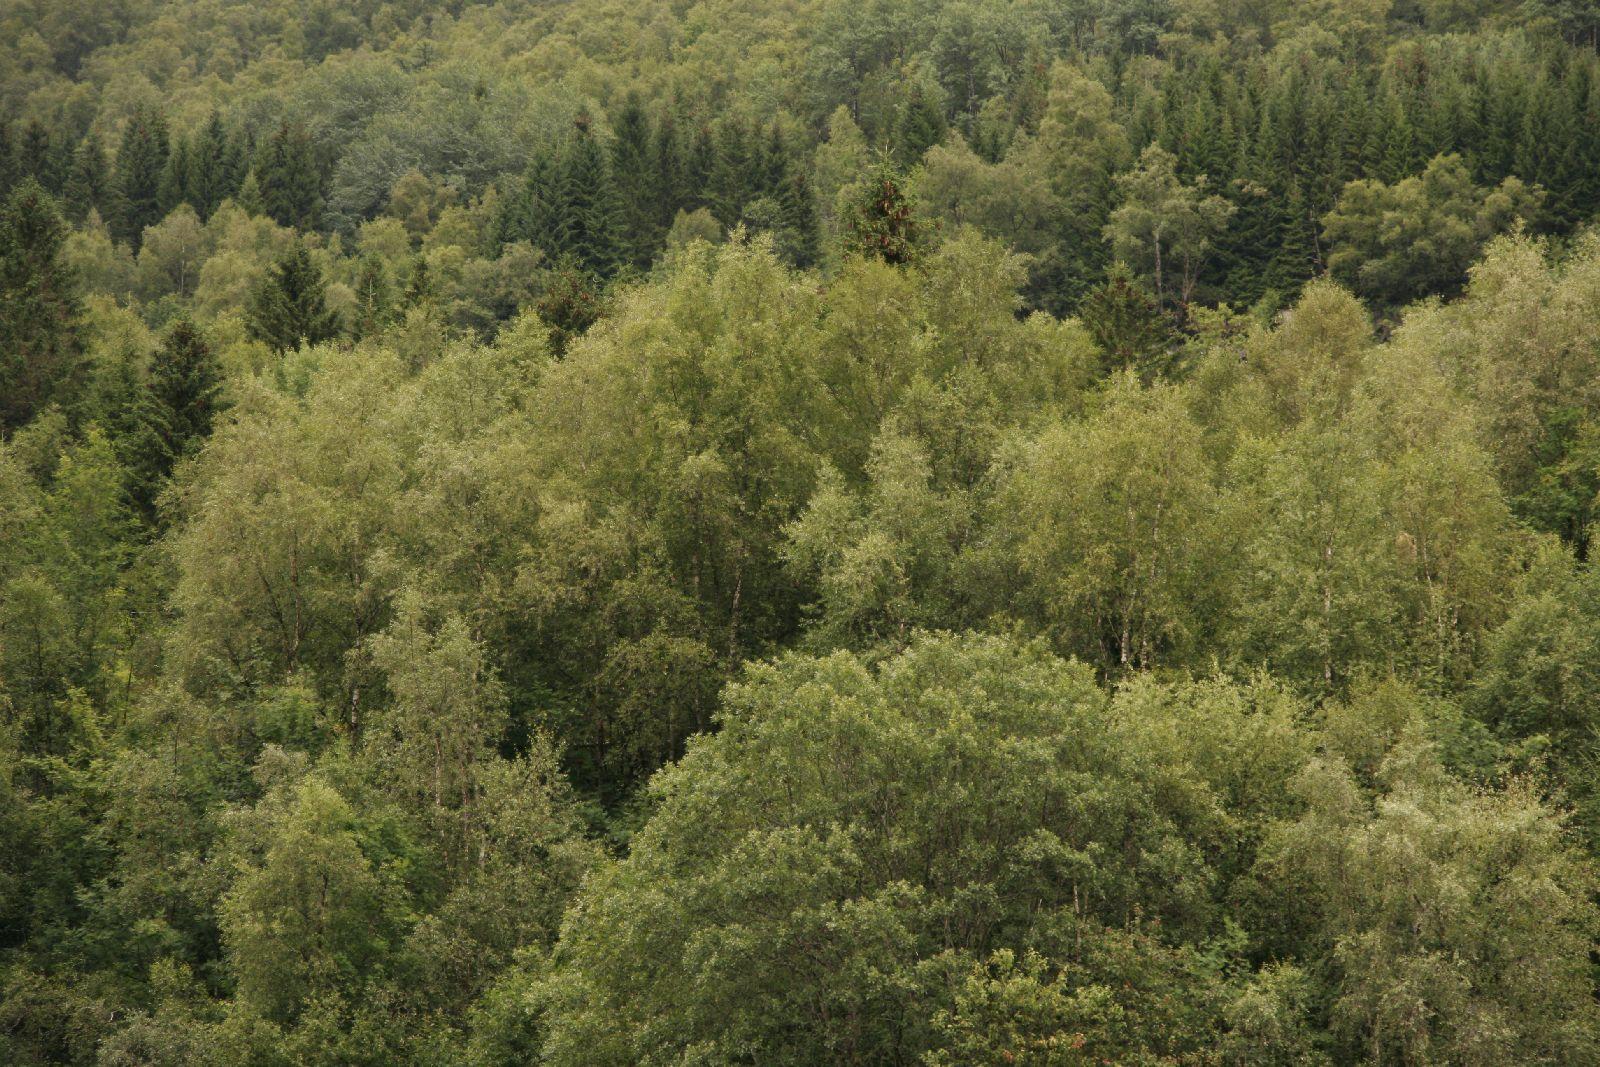 Plants-Trees_Photo_Texture_B__MG_2616